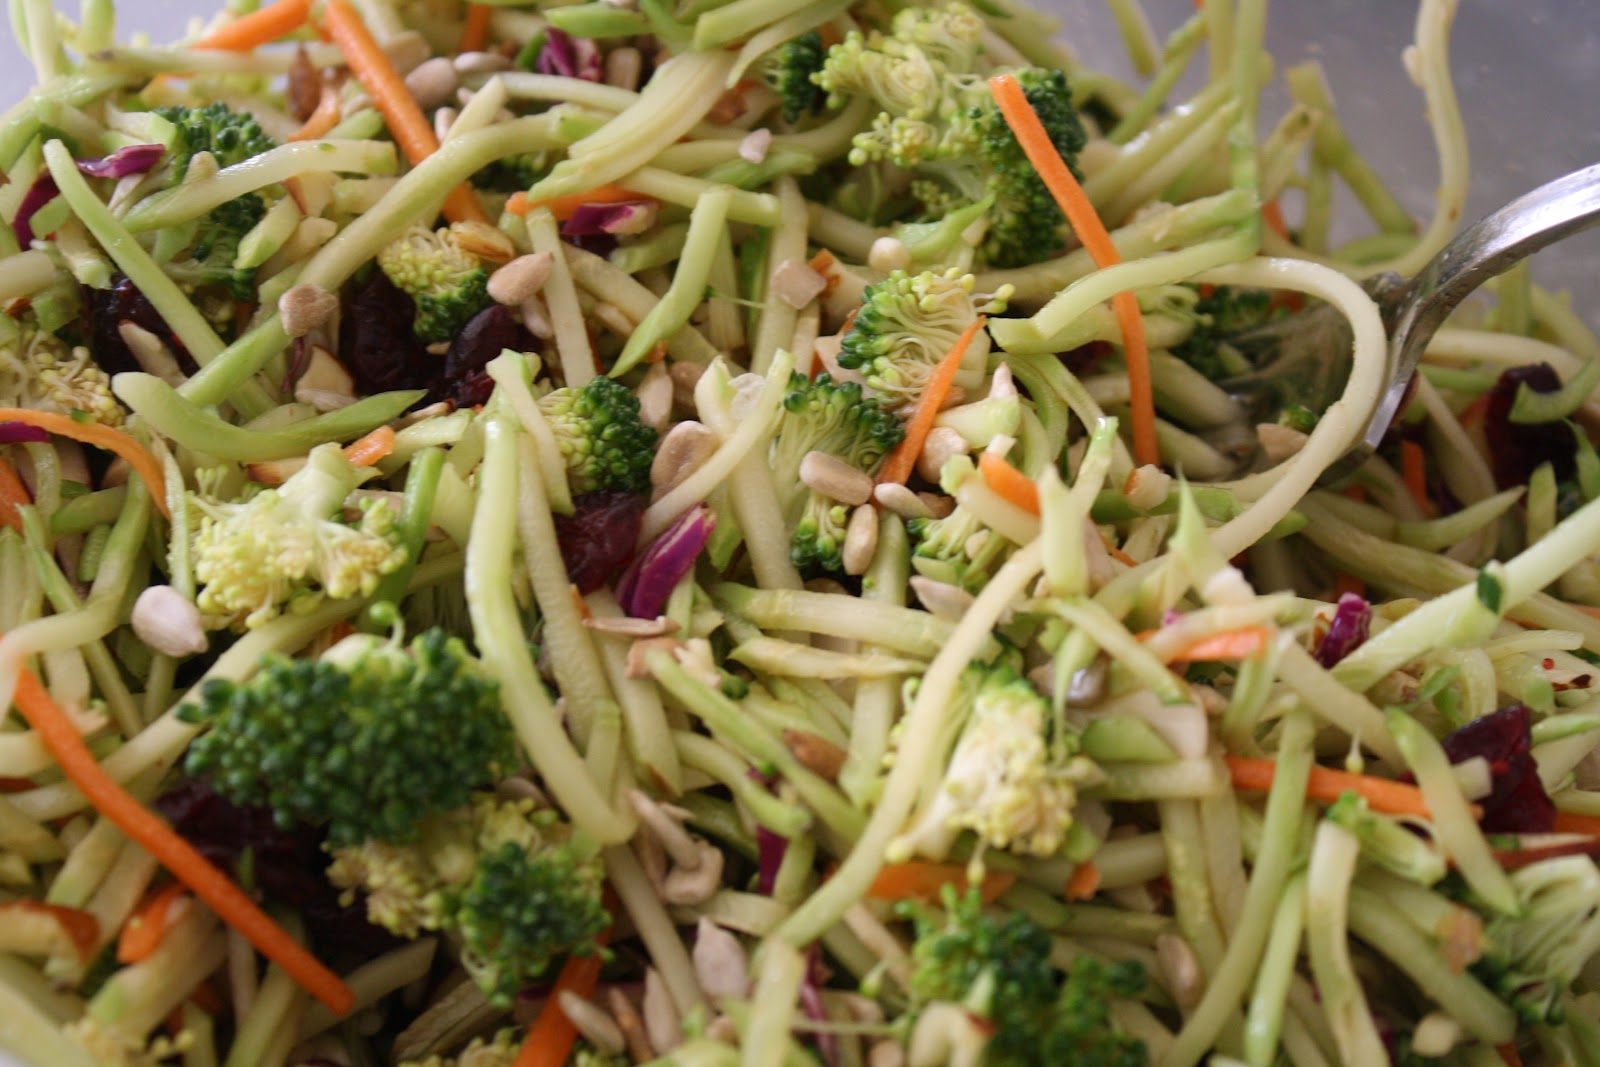 slaw love this asian style broccoli slaw oriental ramen broccoli asian ...